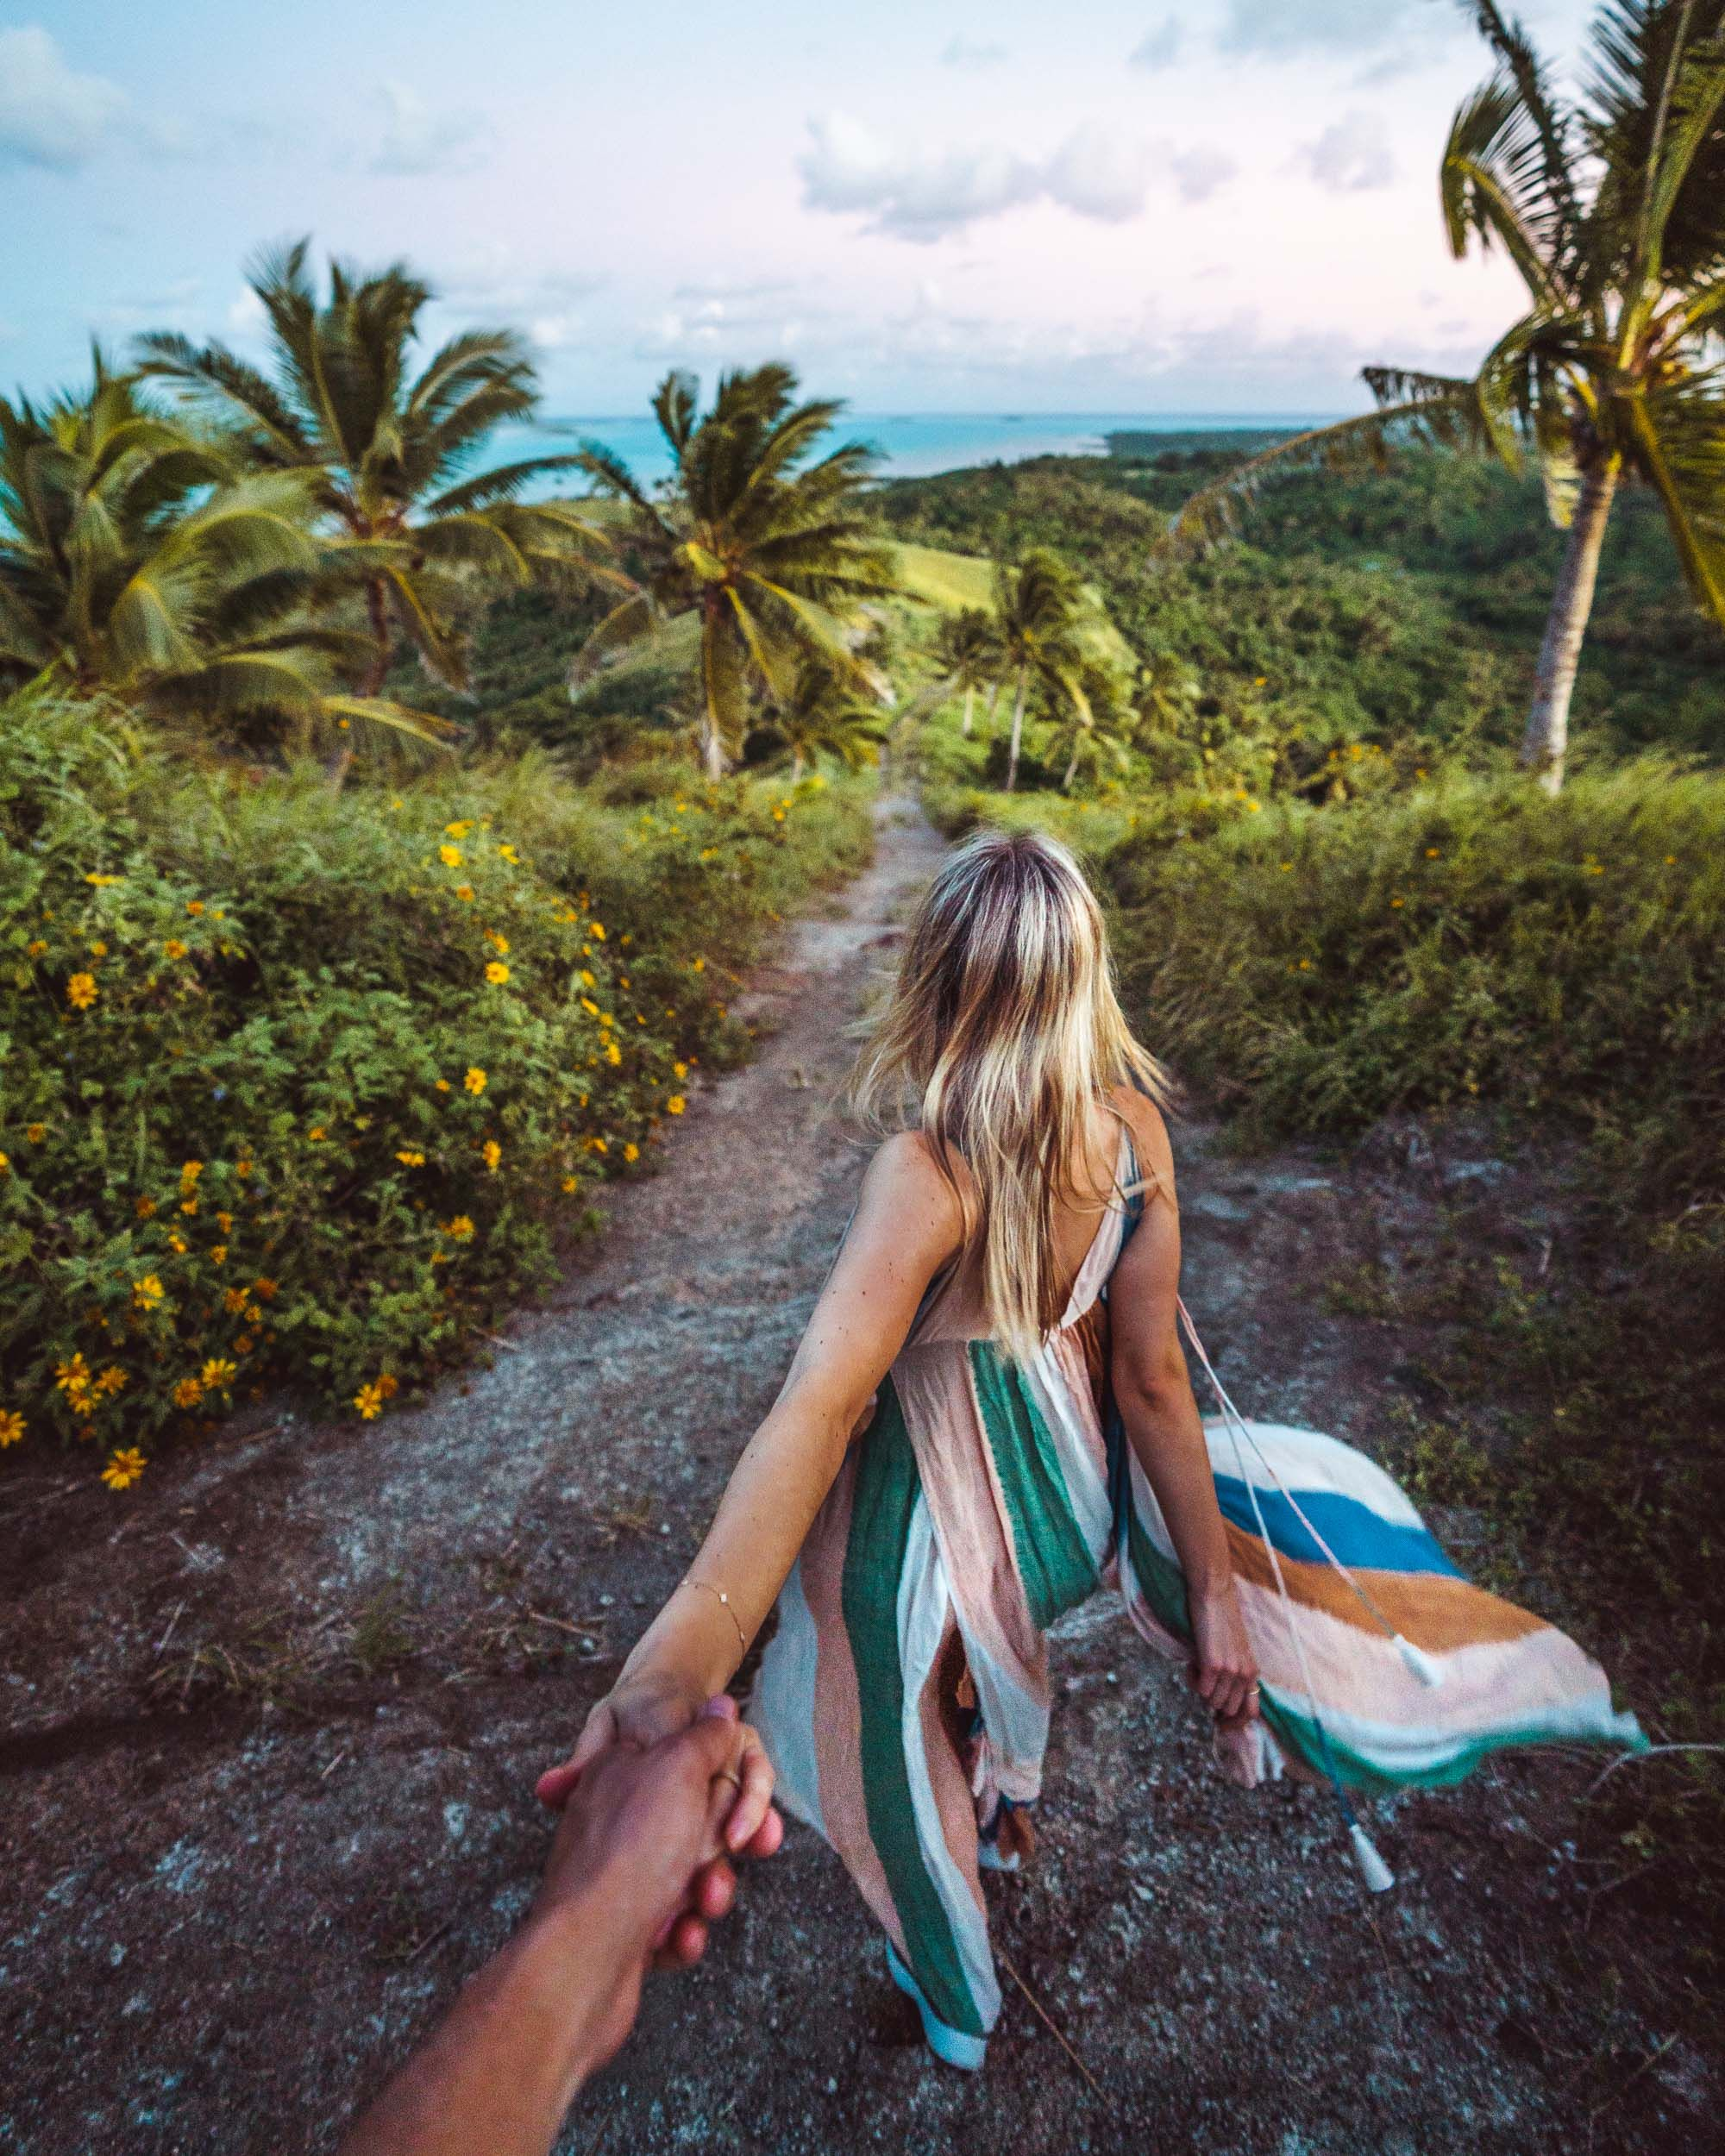 Cook Islands Rarotonga Beach: The Complete Cook Islands Travel Guide